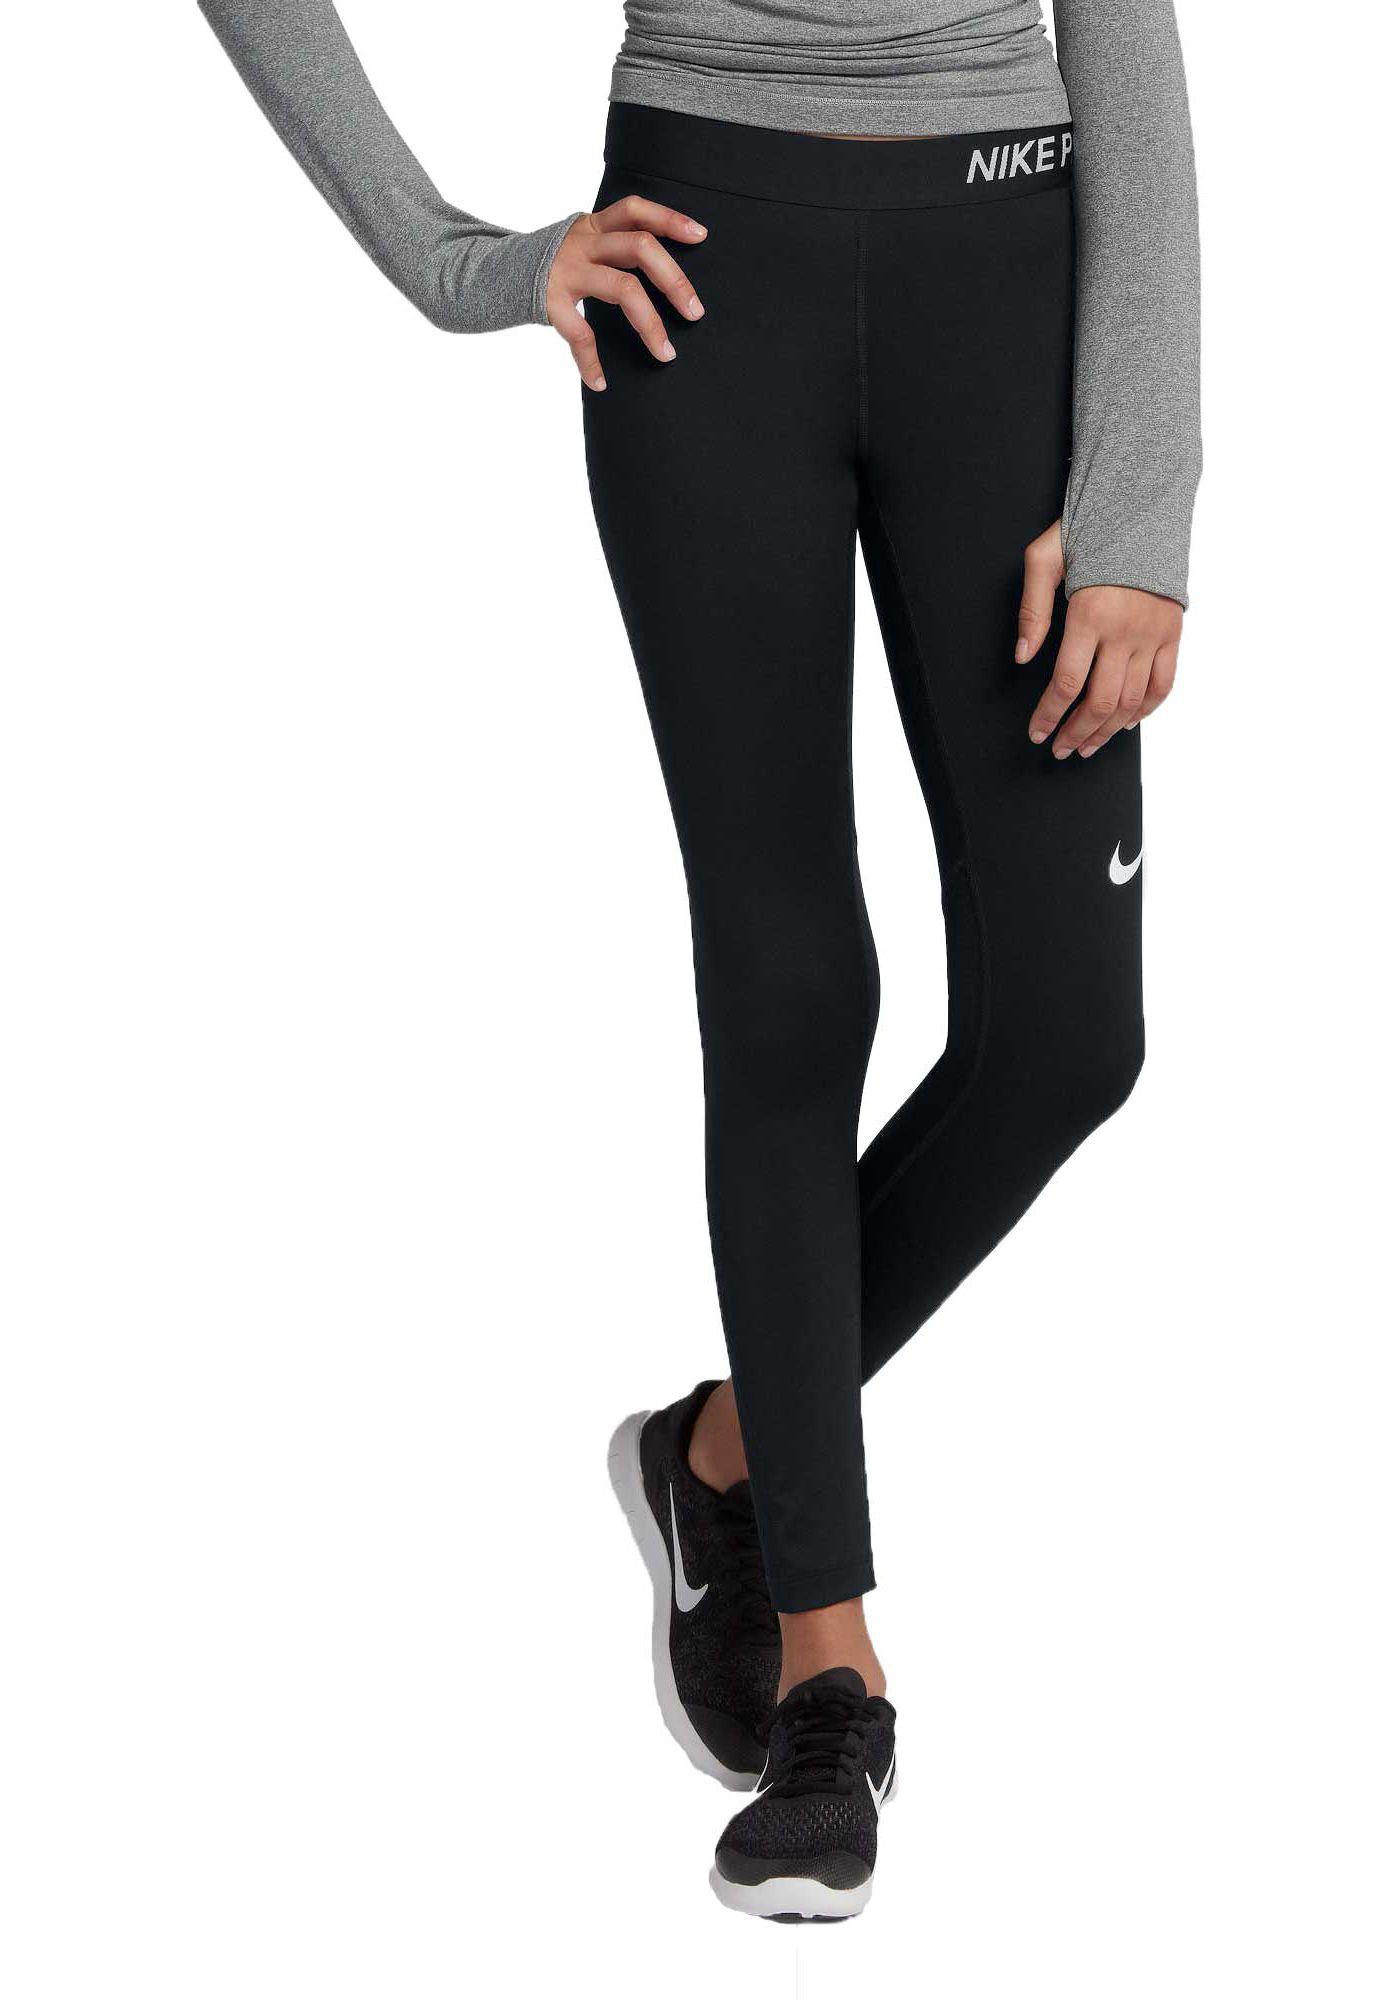 Nike Girls' Pro Cool Tights